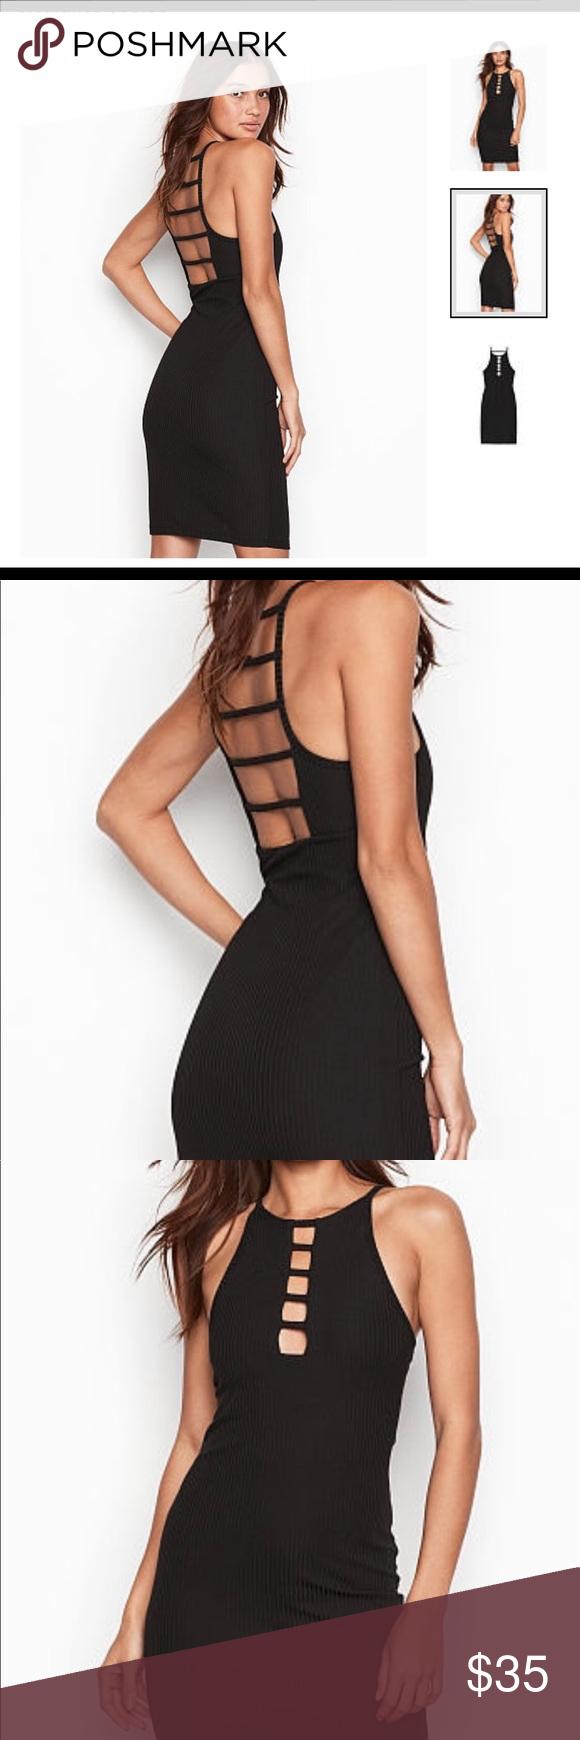 Victoria S Secret Dress Super Cute Black Dress Can Fit A Size 4 8 Victoria S Secret Dresses Mini Cute Black Dress Ribbed Dresses Secret Dress [ 1740 x 580 Pixel ]